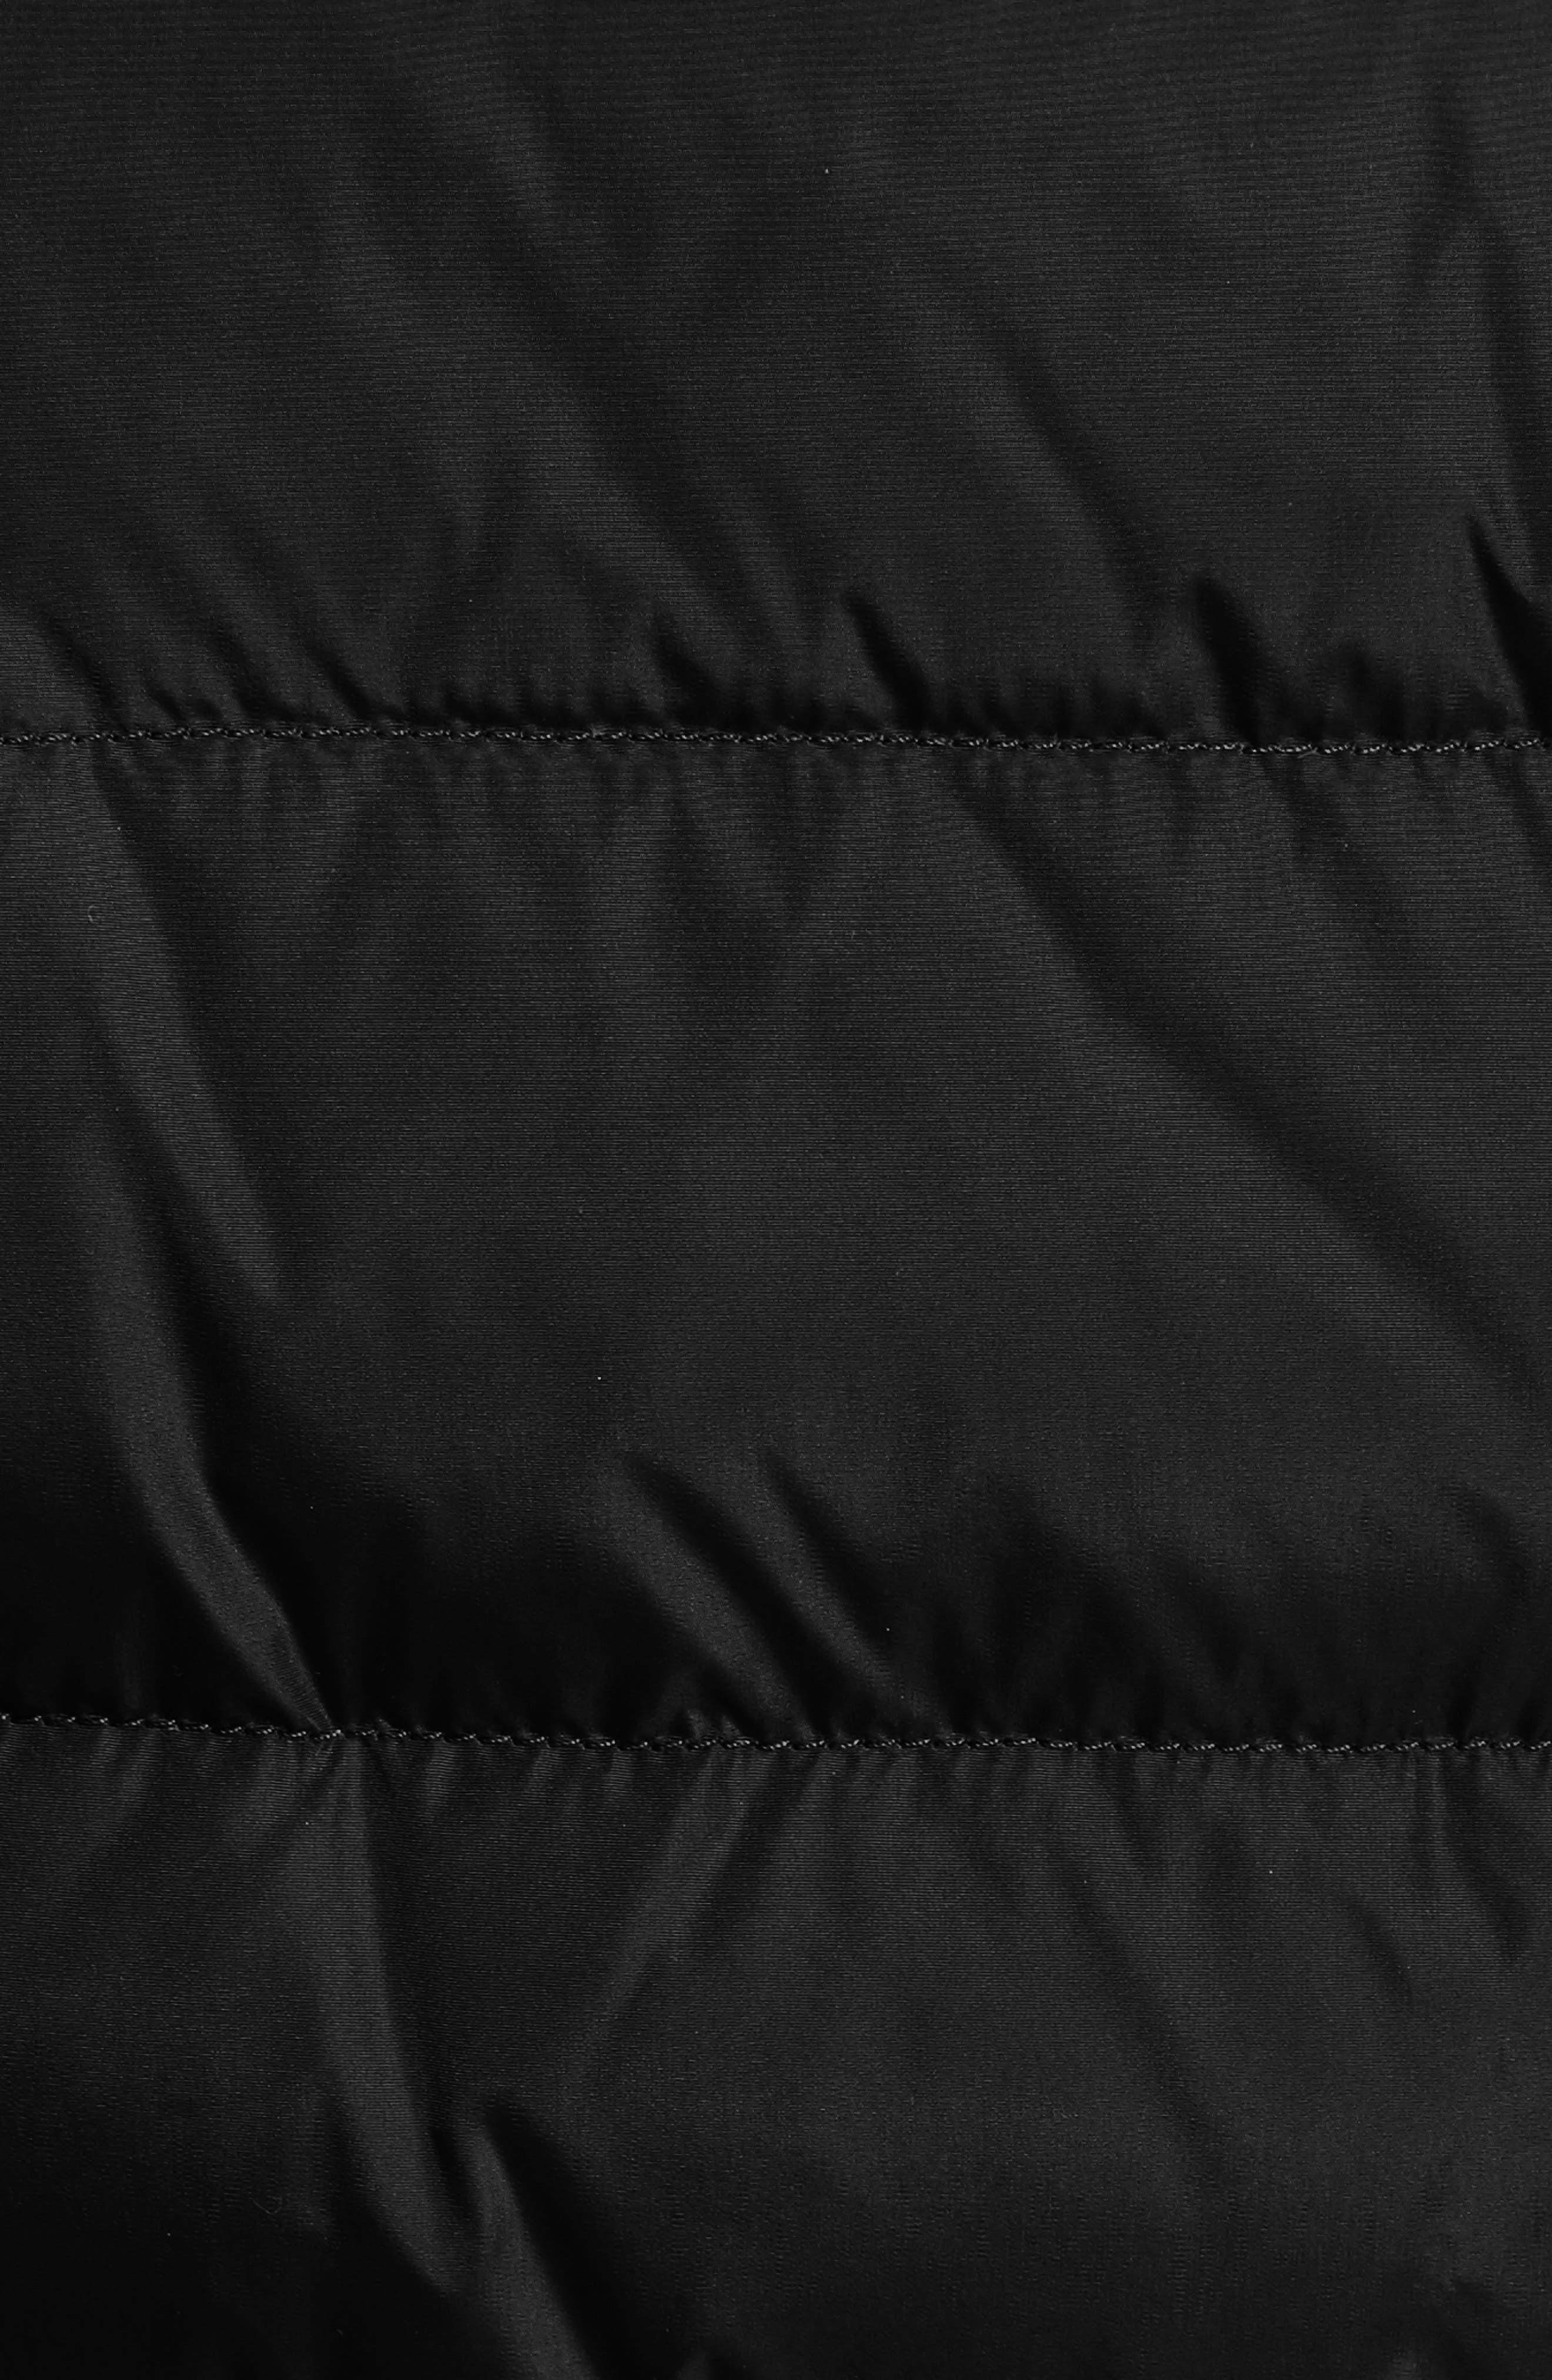 MONCLER,                             'Flammette' Water Resistant Long Hooded Down Coat,                             Alternate thumbnail 6, color,                             BLACK